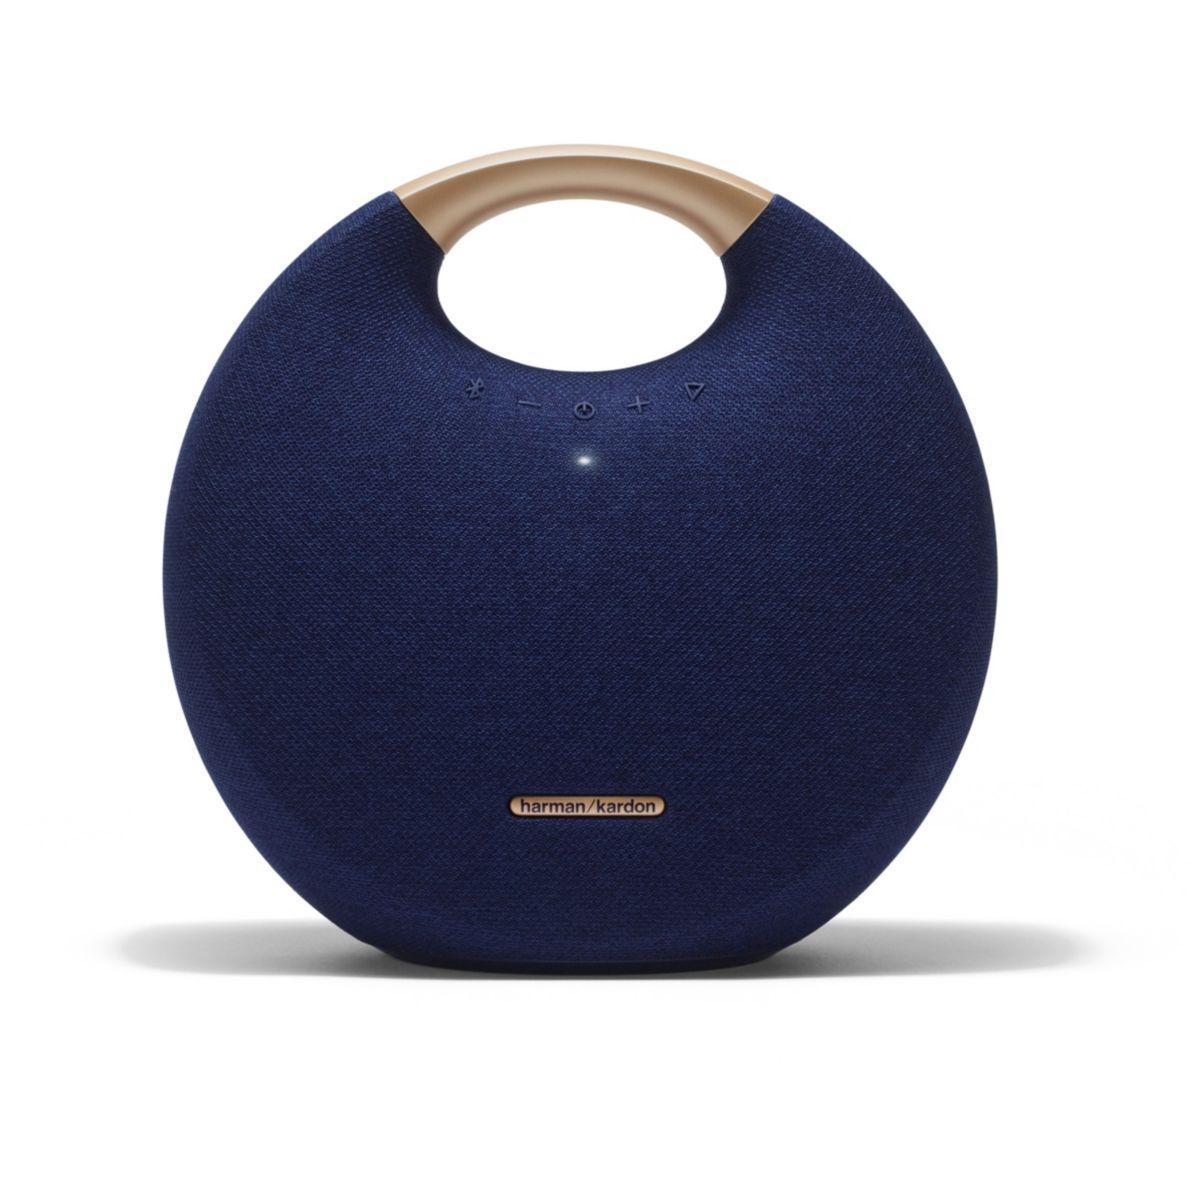 Enceinte bluetooth harman kardon onyx studio 5 bleu - livraison offerte : code premium (photo)